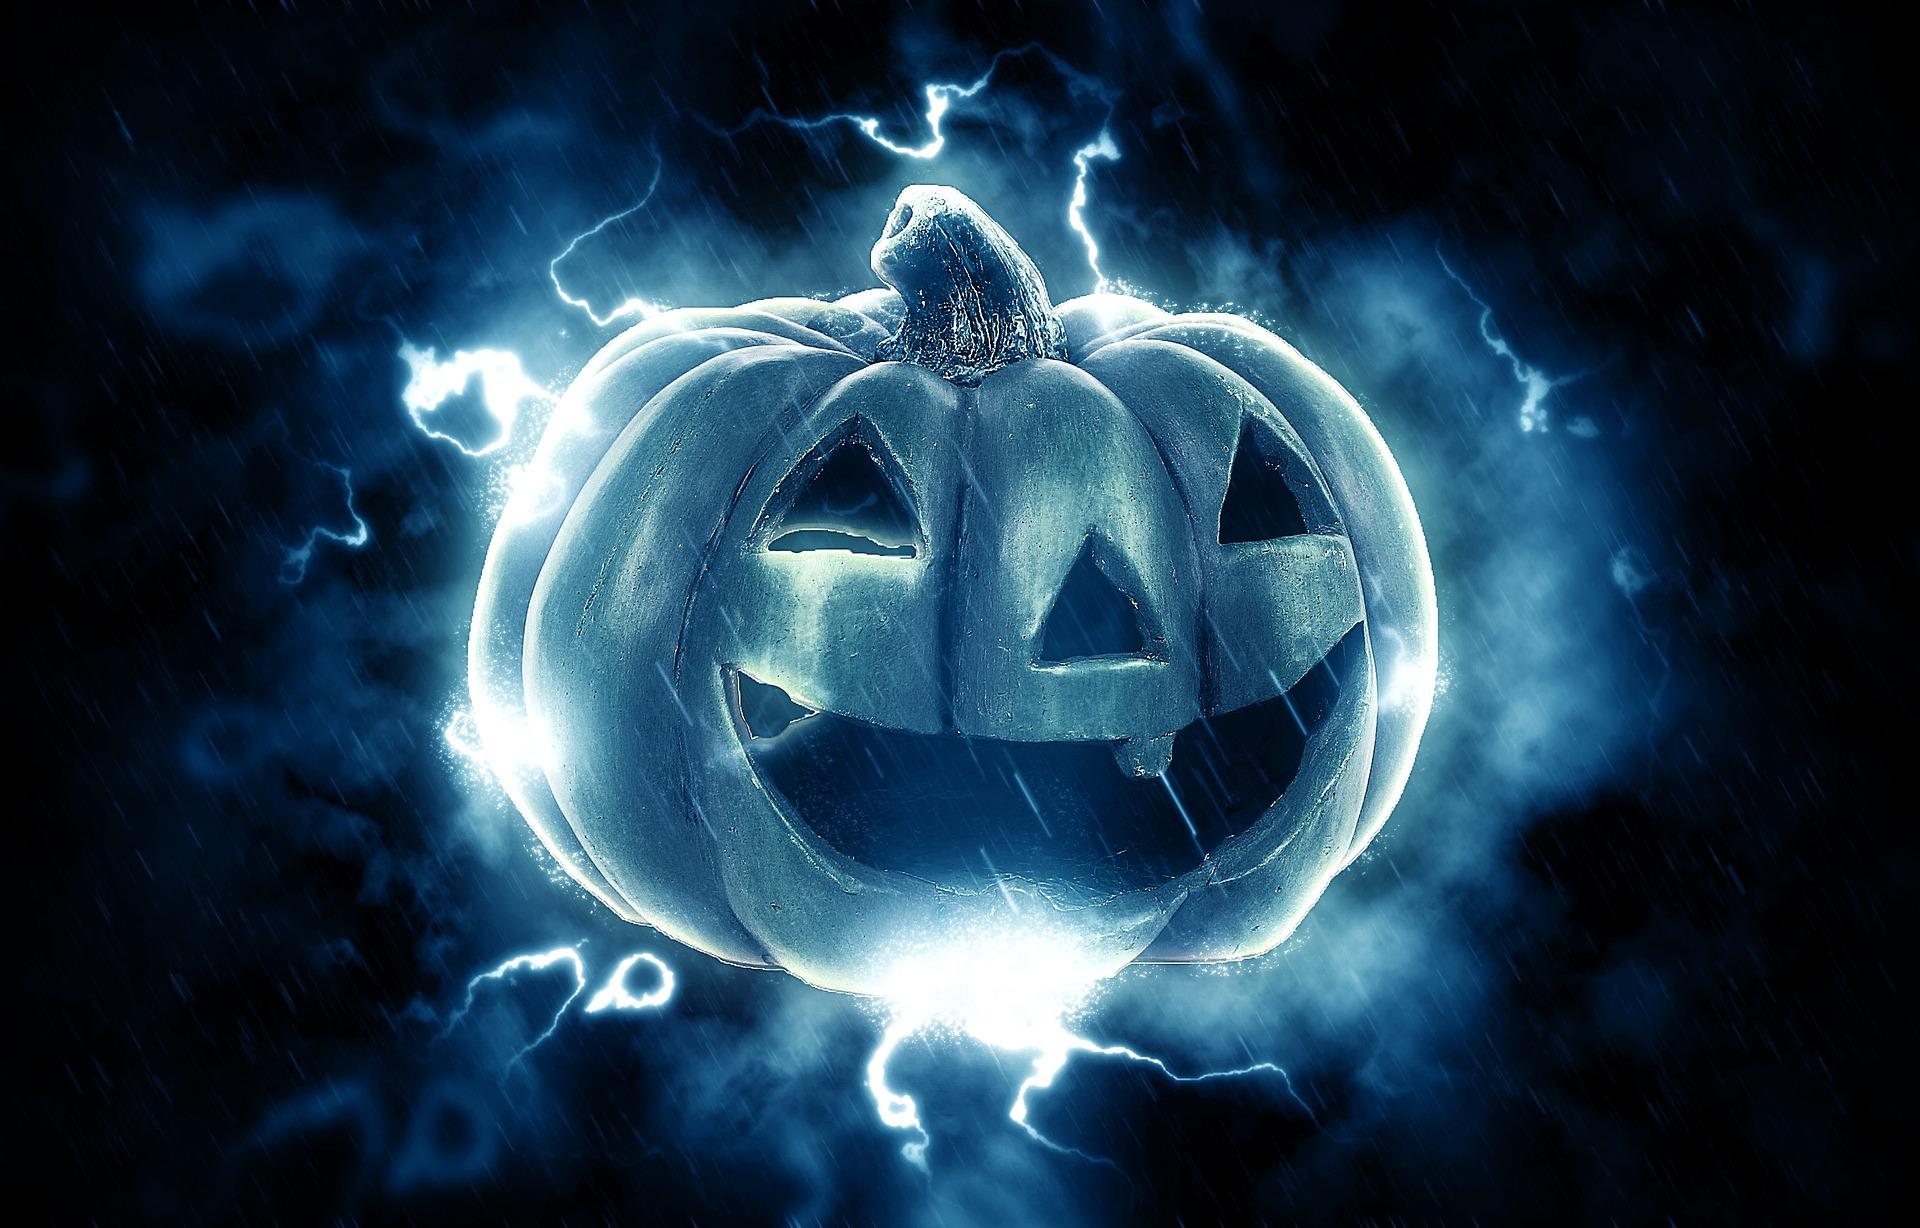 lightning striking blue pumpkin